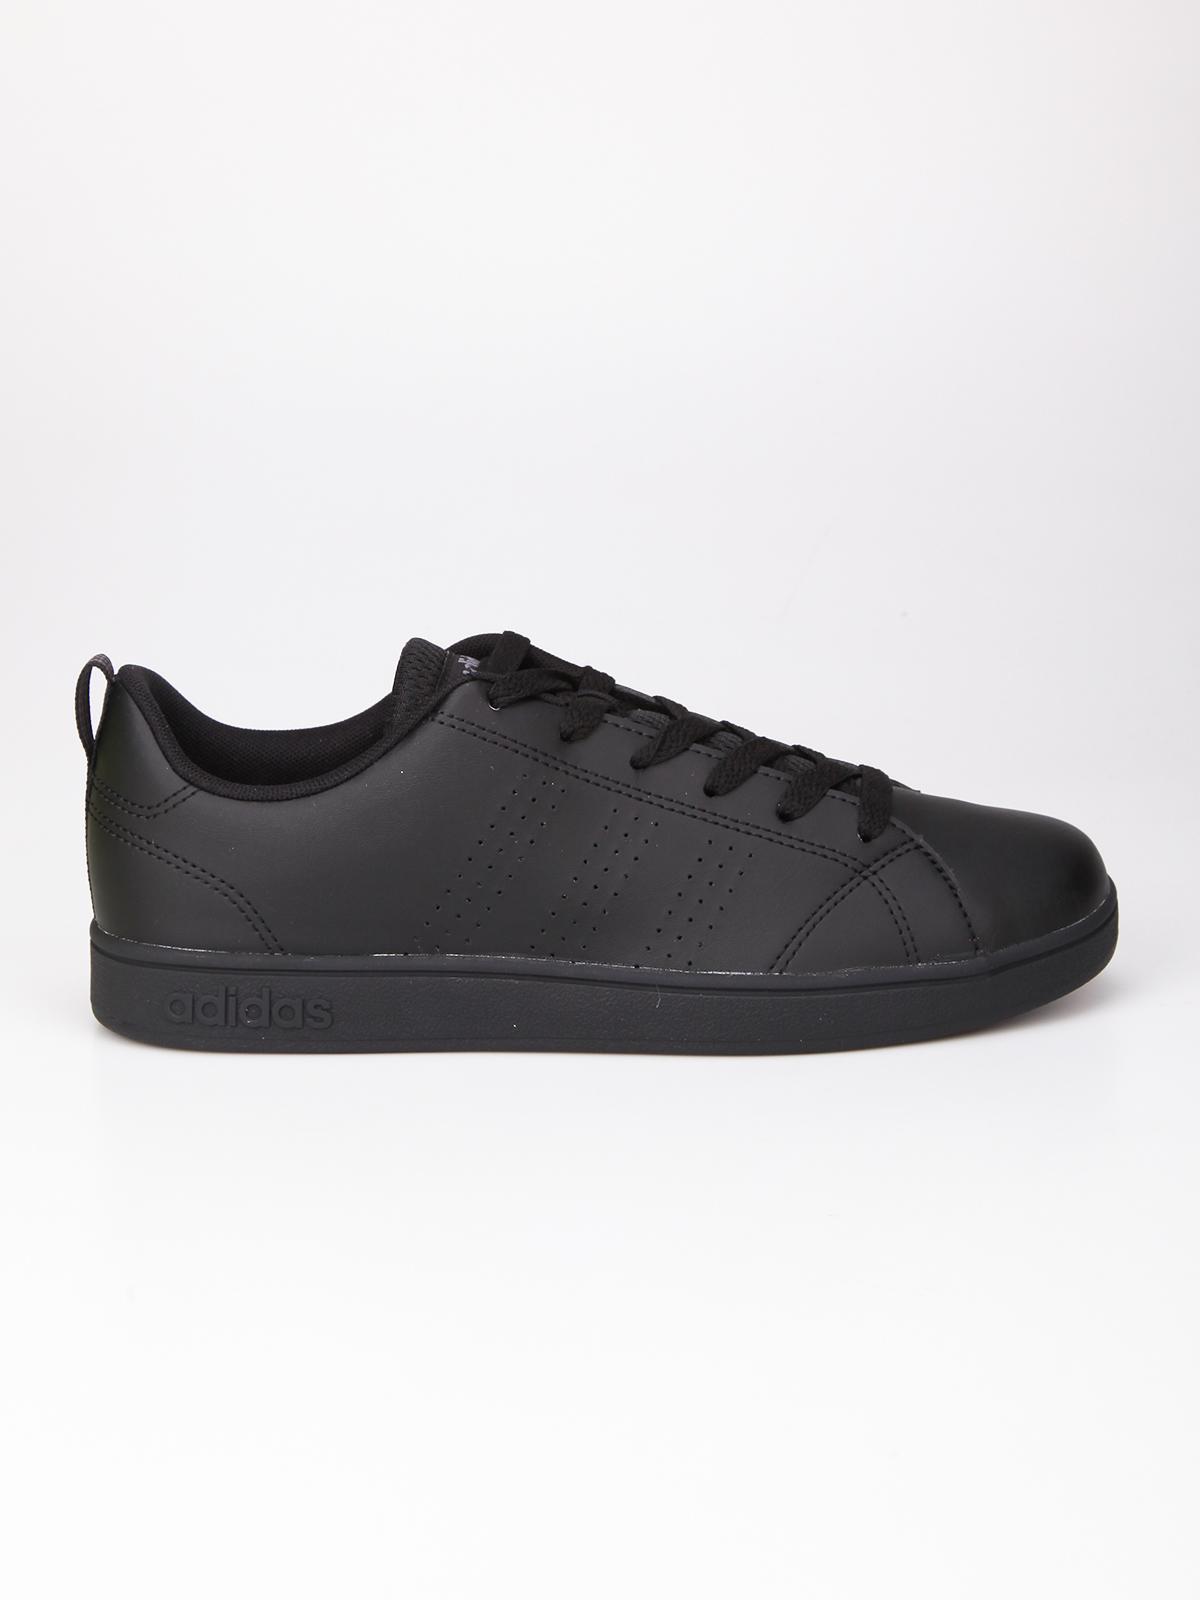 Basse Vs Sneakers Advantage AdidasMecshopping Nere Clean K vymnwO8N0